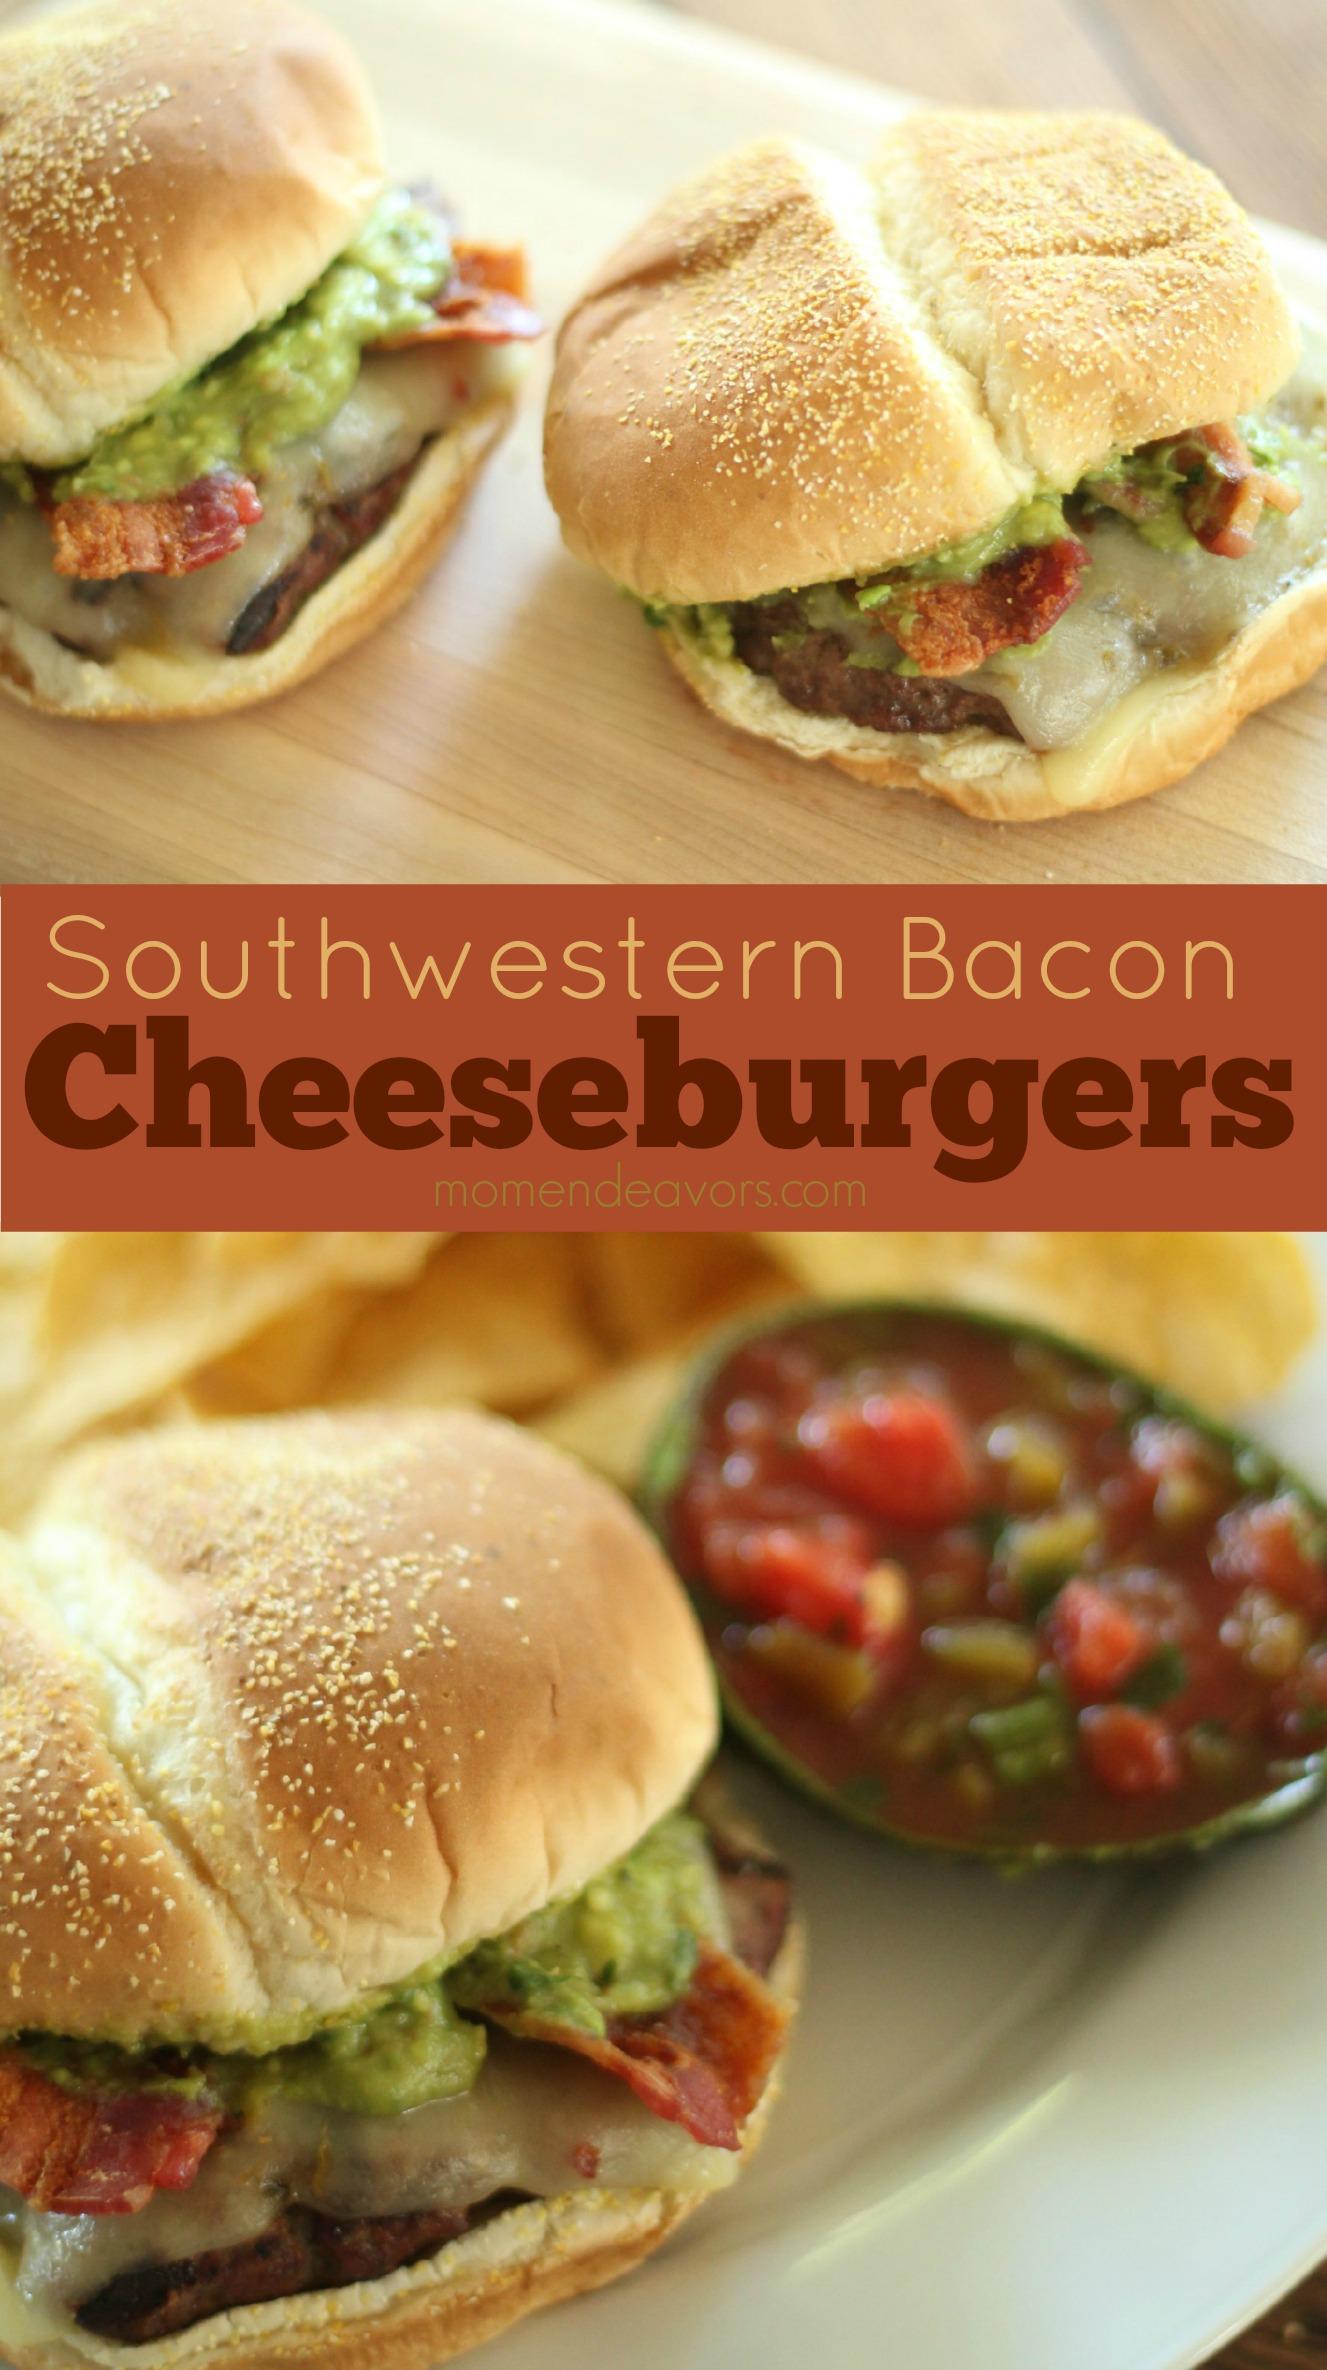 Easy Southwestern Bacon Cheeseburgers with Guacamole